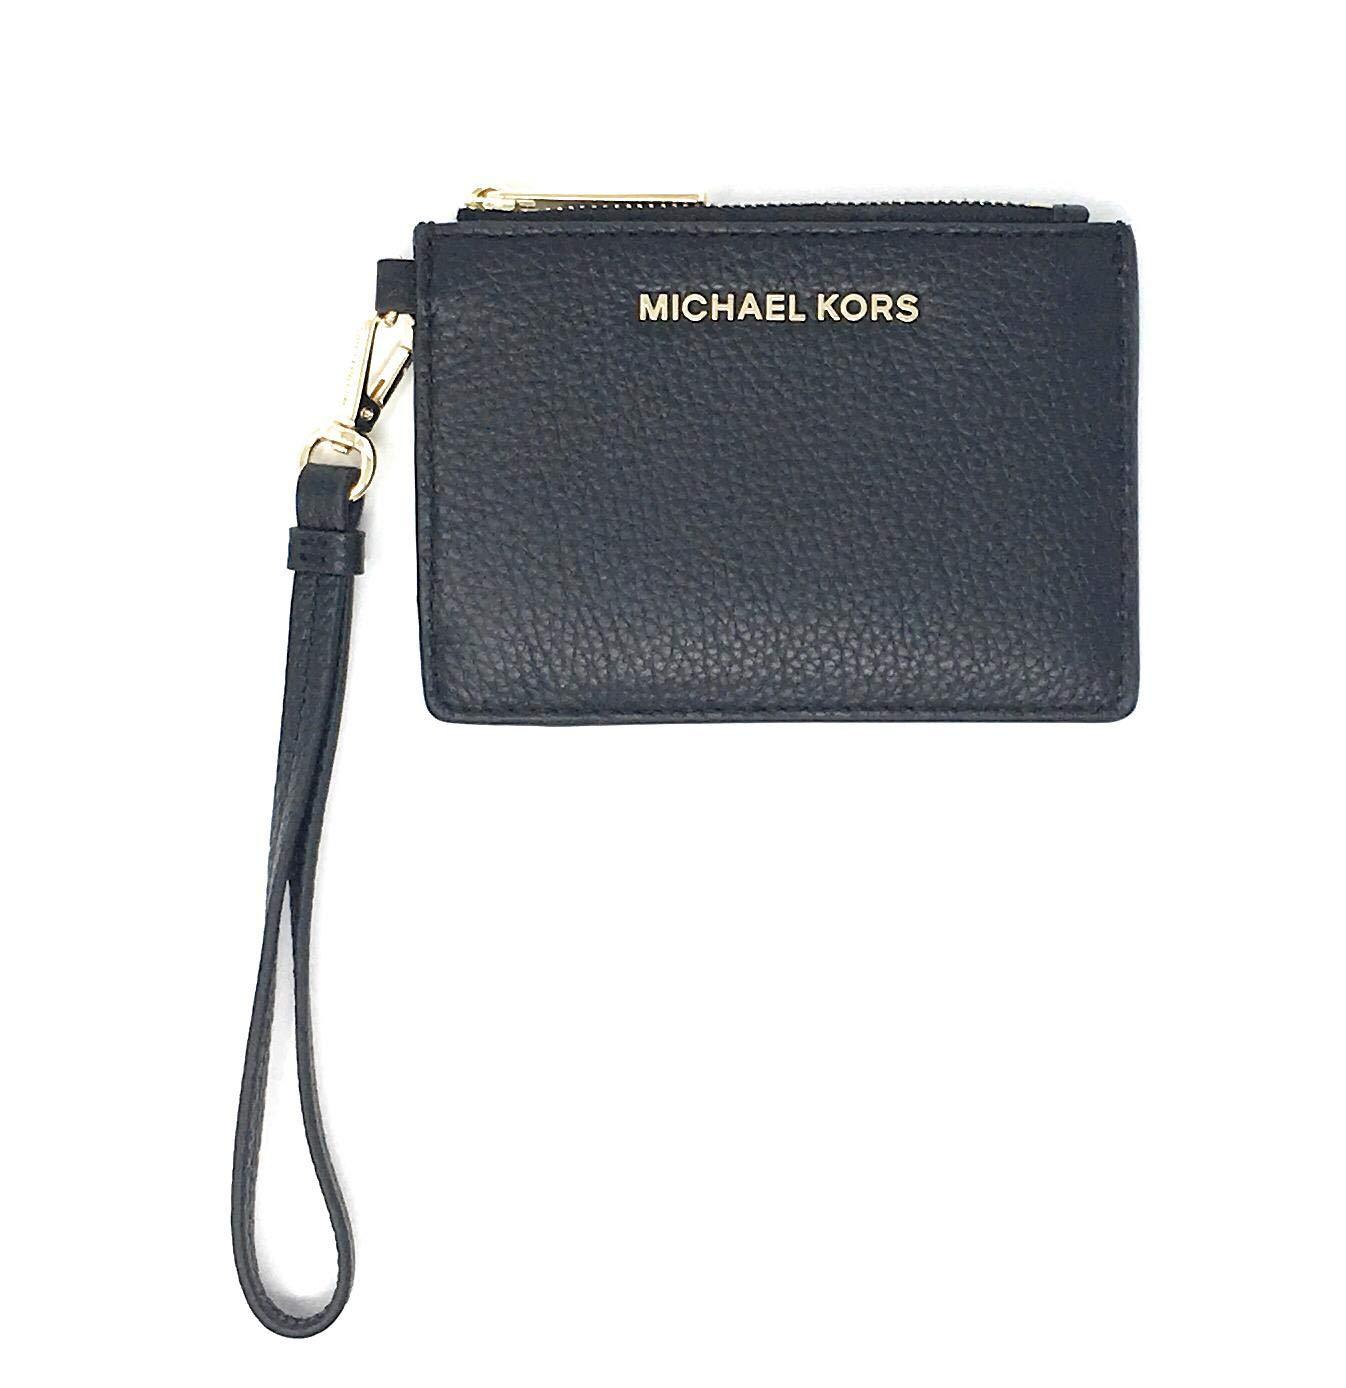 Michael Kors Jet Set Travel Coin Purse Wristlet Leather Card Case Black by Michael Kors